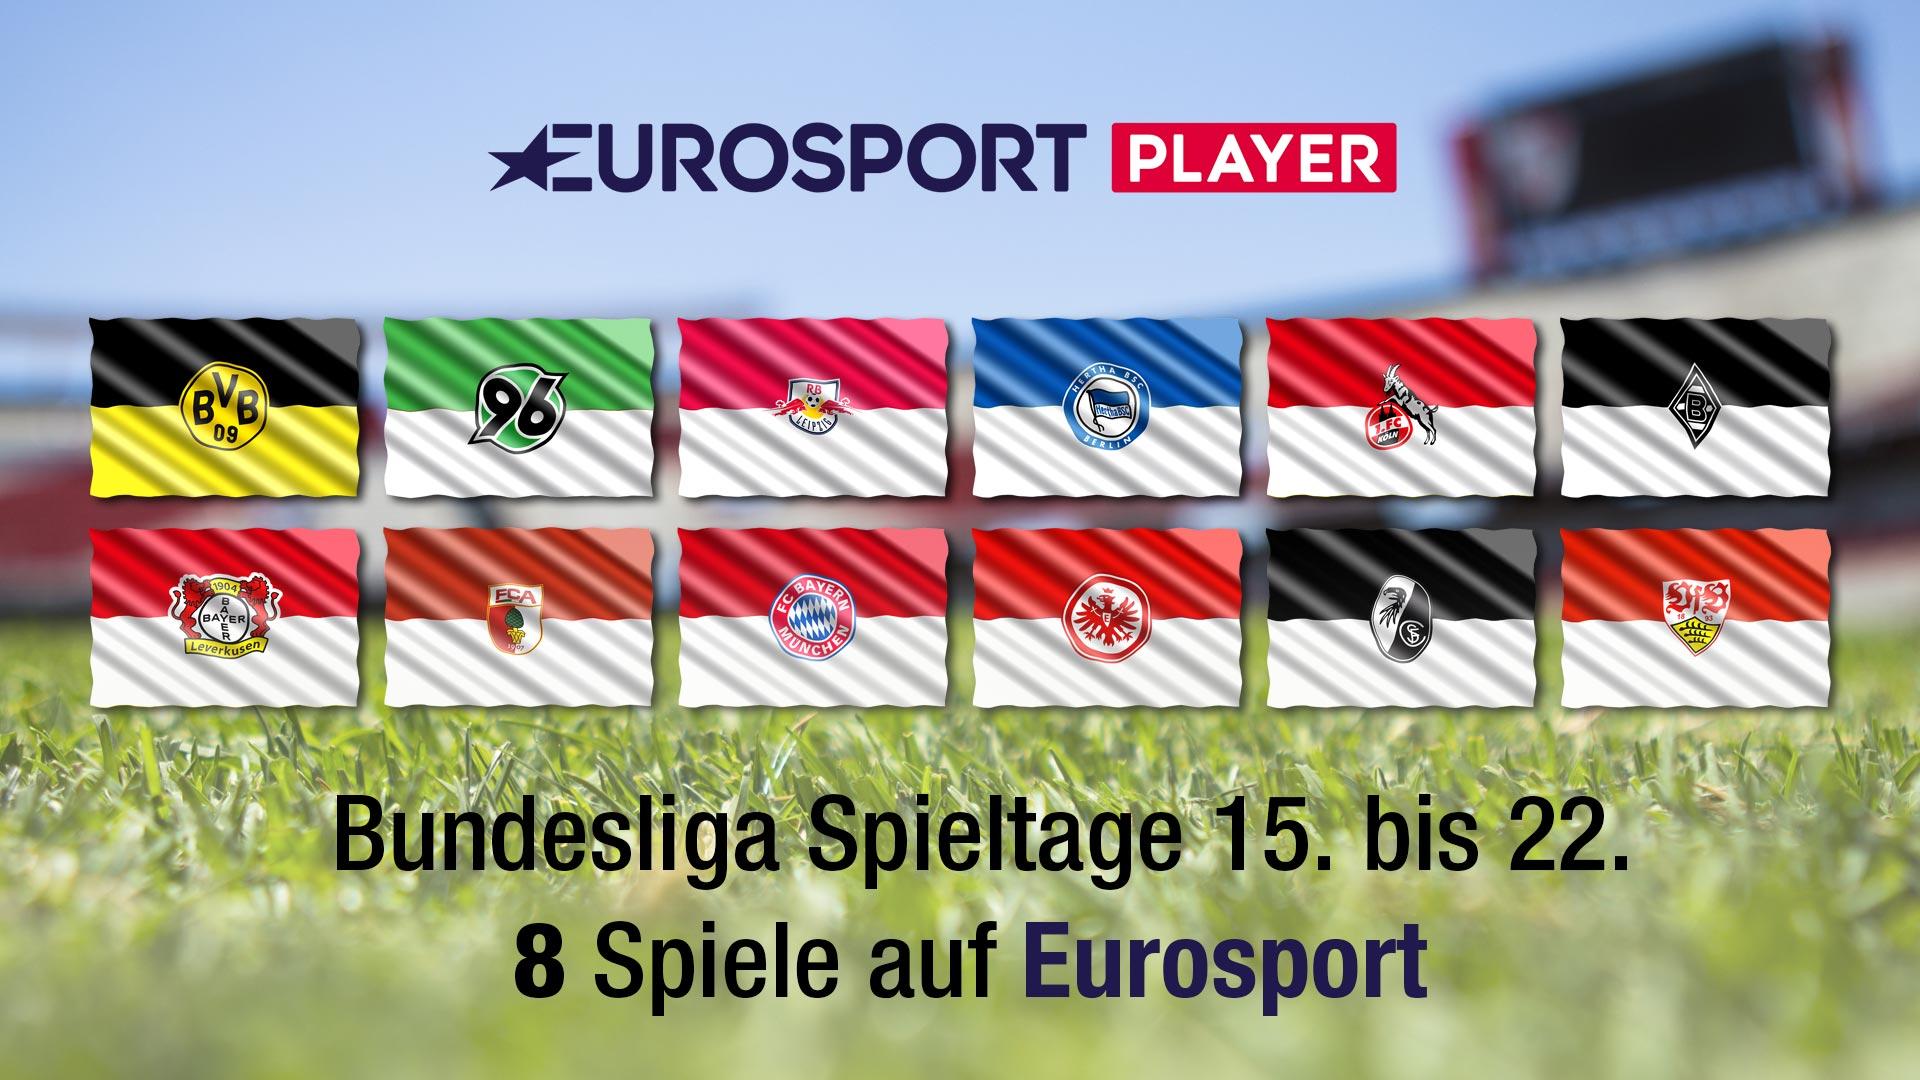 Eurosport Player Bundesliga Spiele